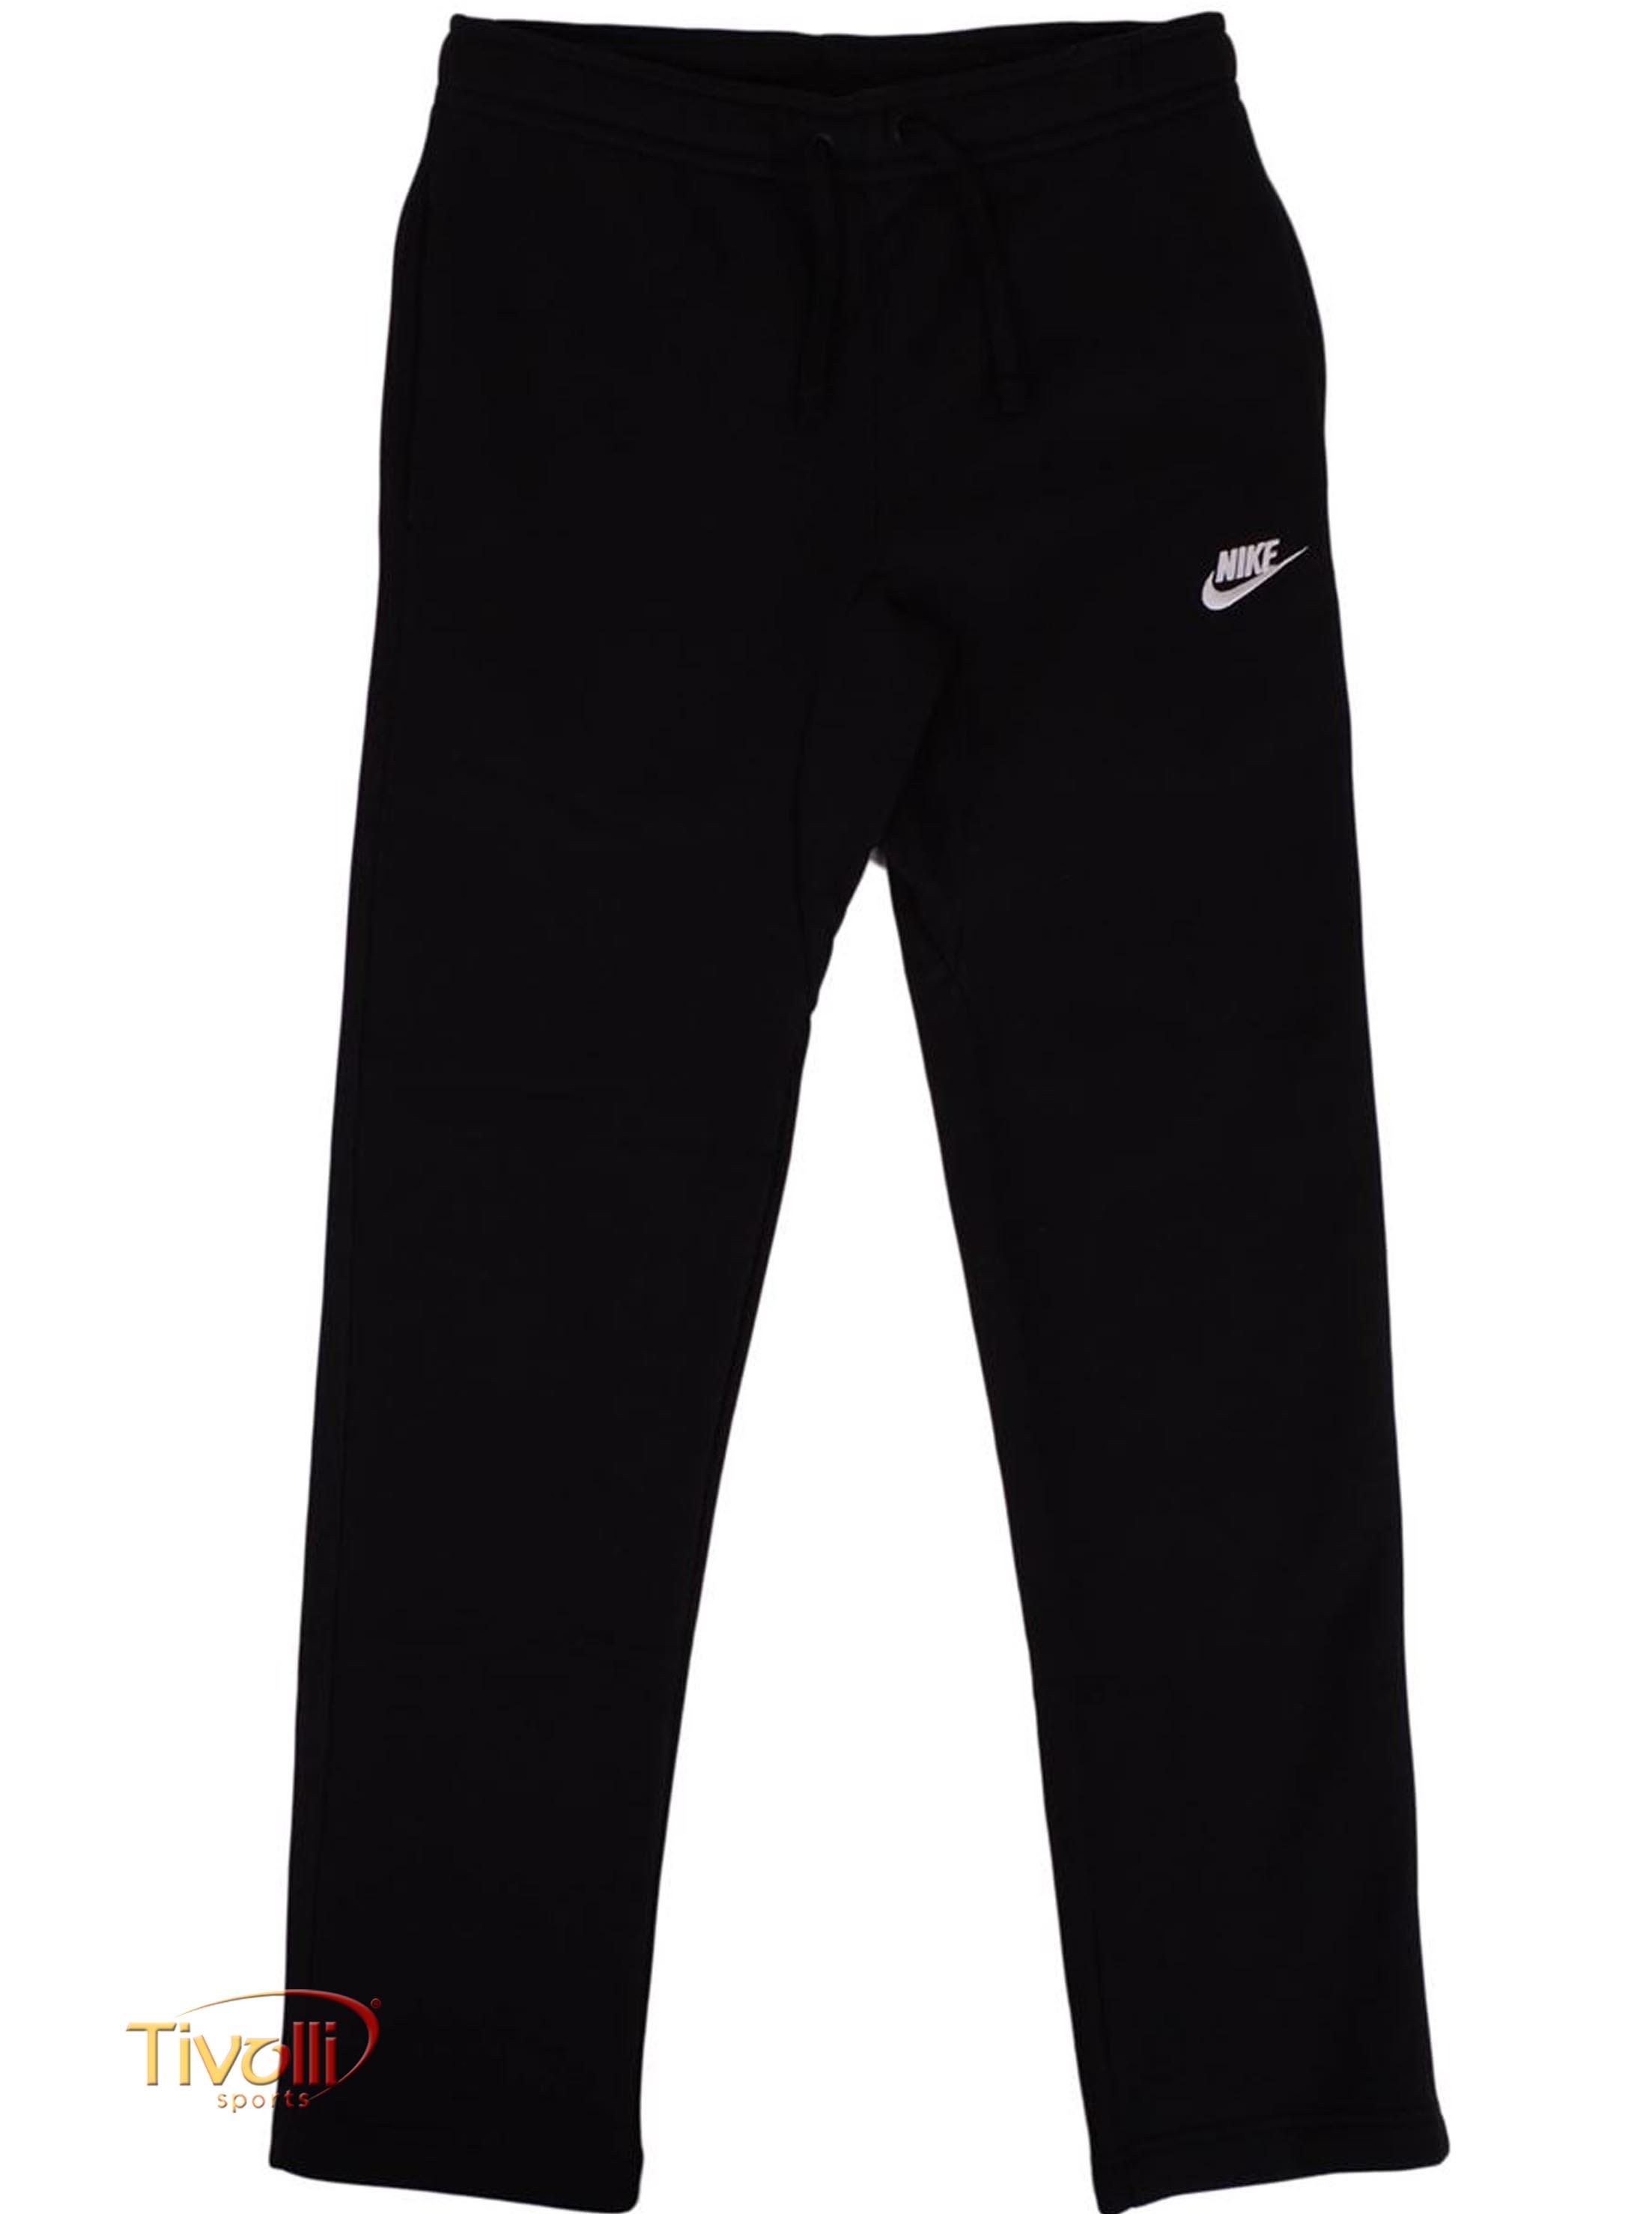 845b8953ae Calça Nike Sportswear Pant OH FLC Club